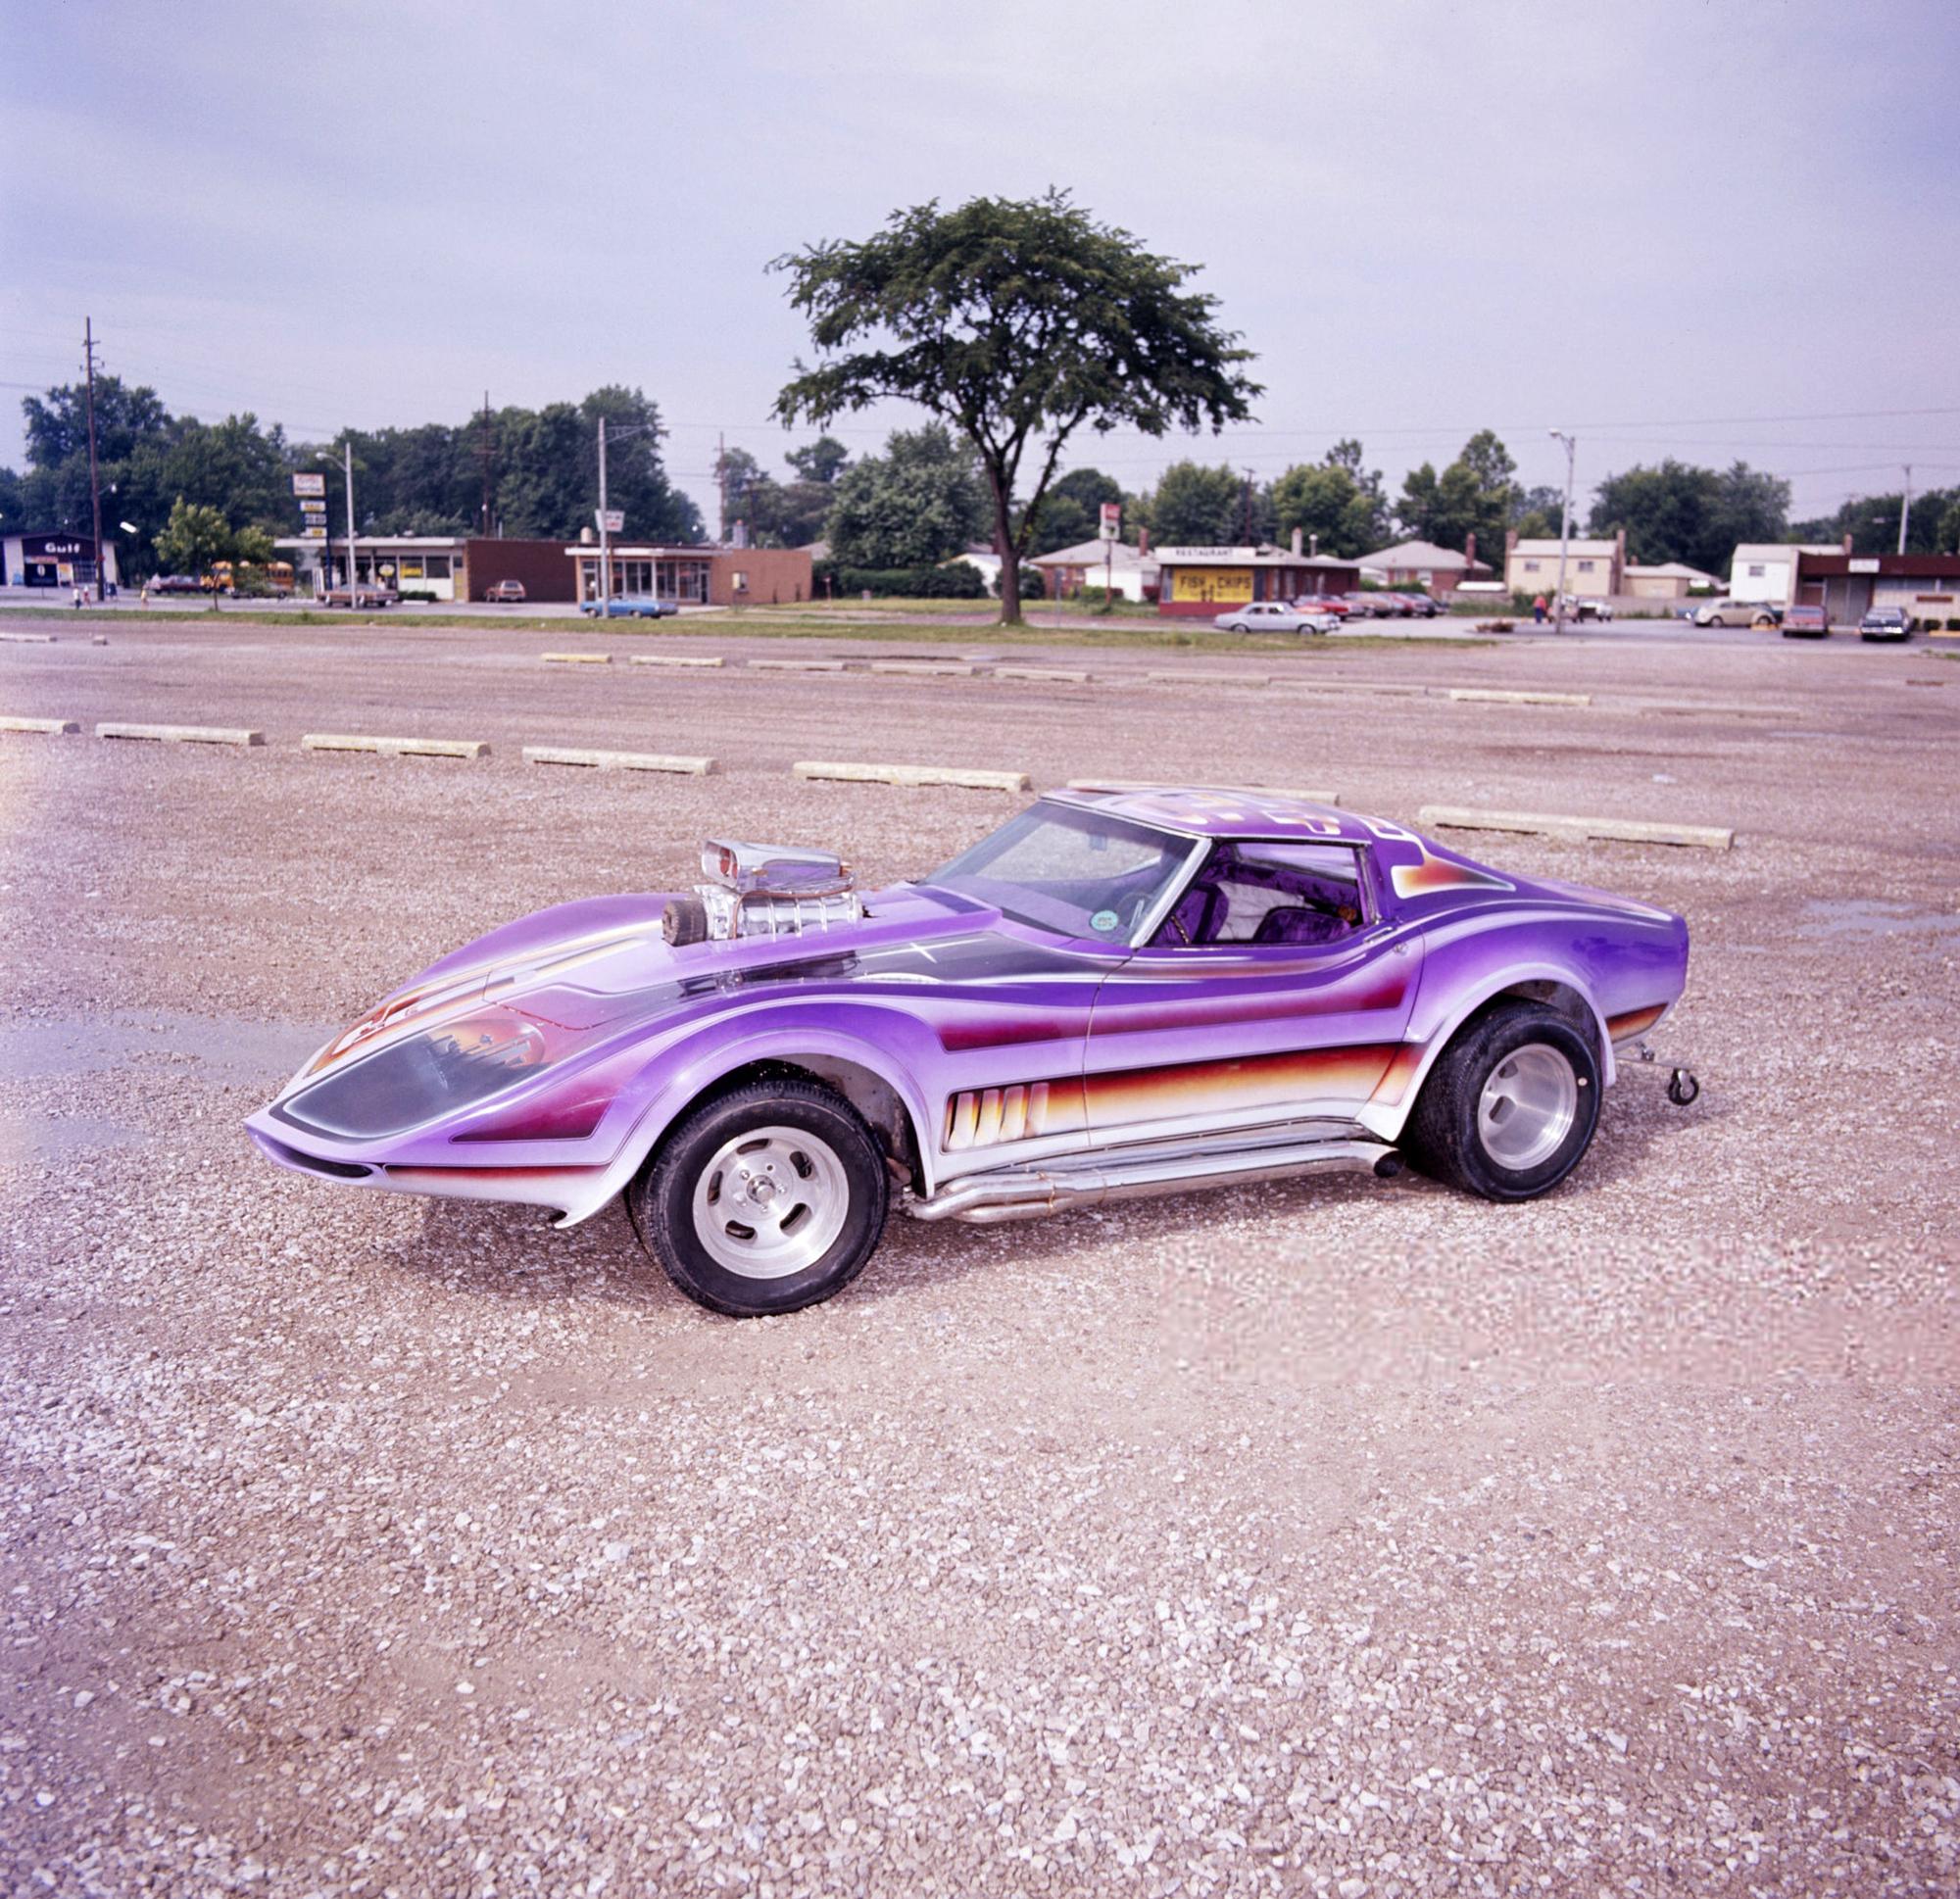 Rick Todd's Corvette, photo 2.